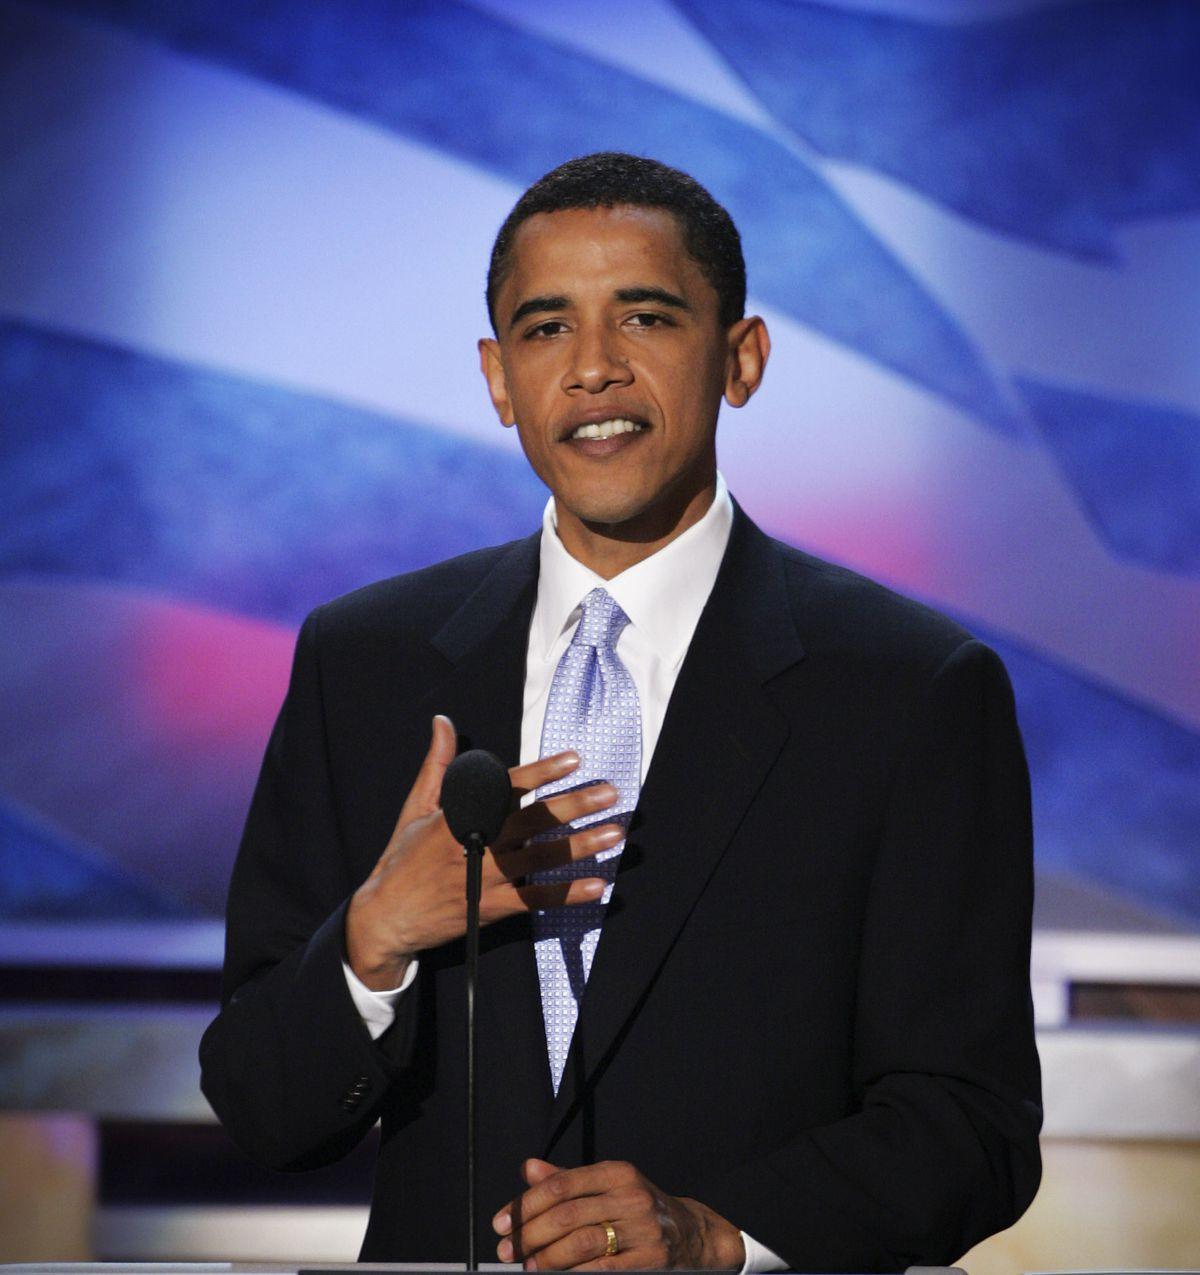 Barack Obama, Illinois senatorial candidate, addresses delegates at the Democratic National Convention in Boston.